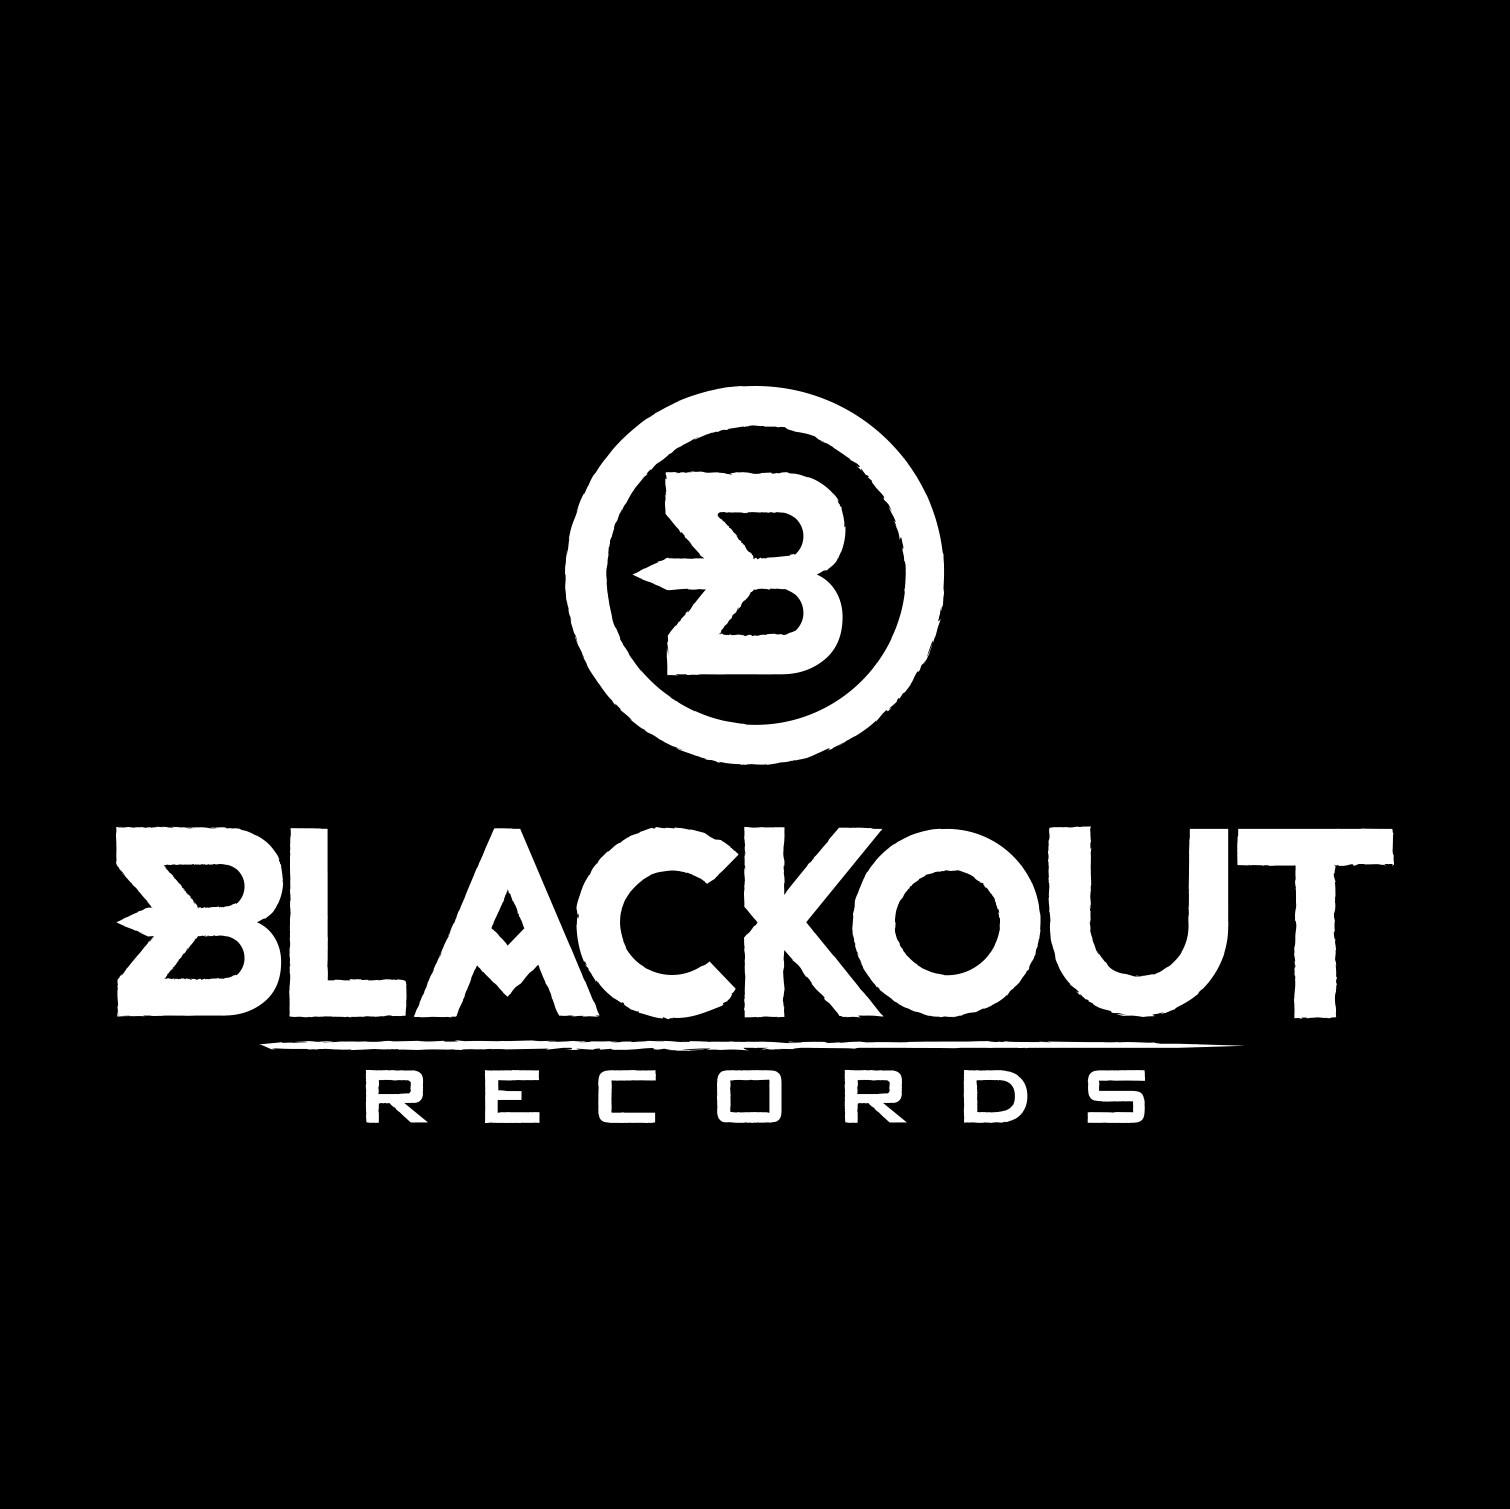 Blackout Rec